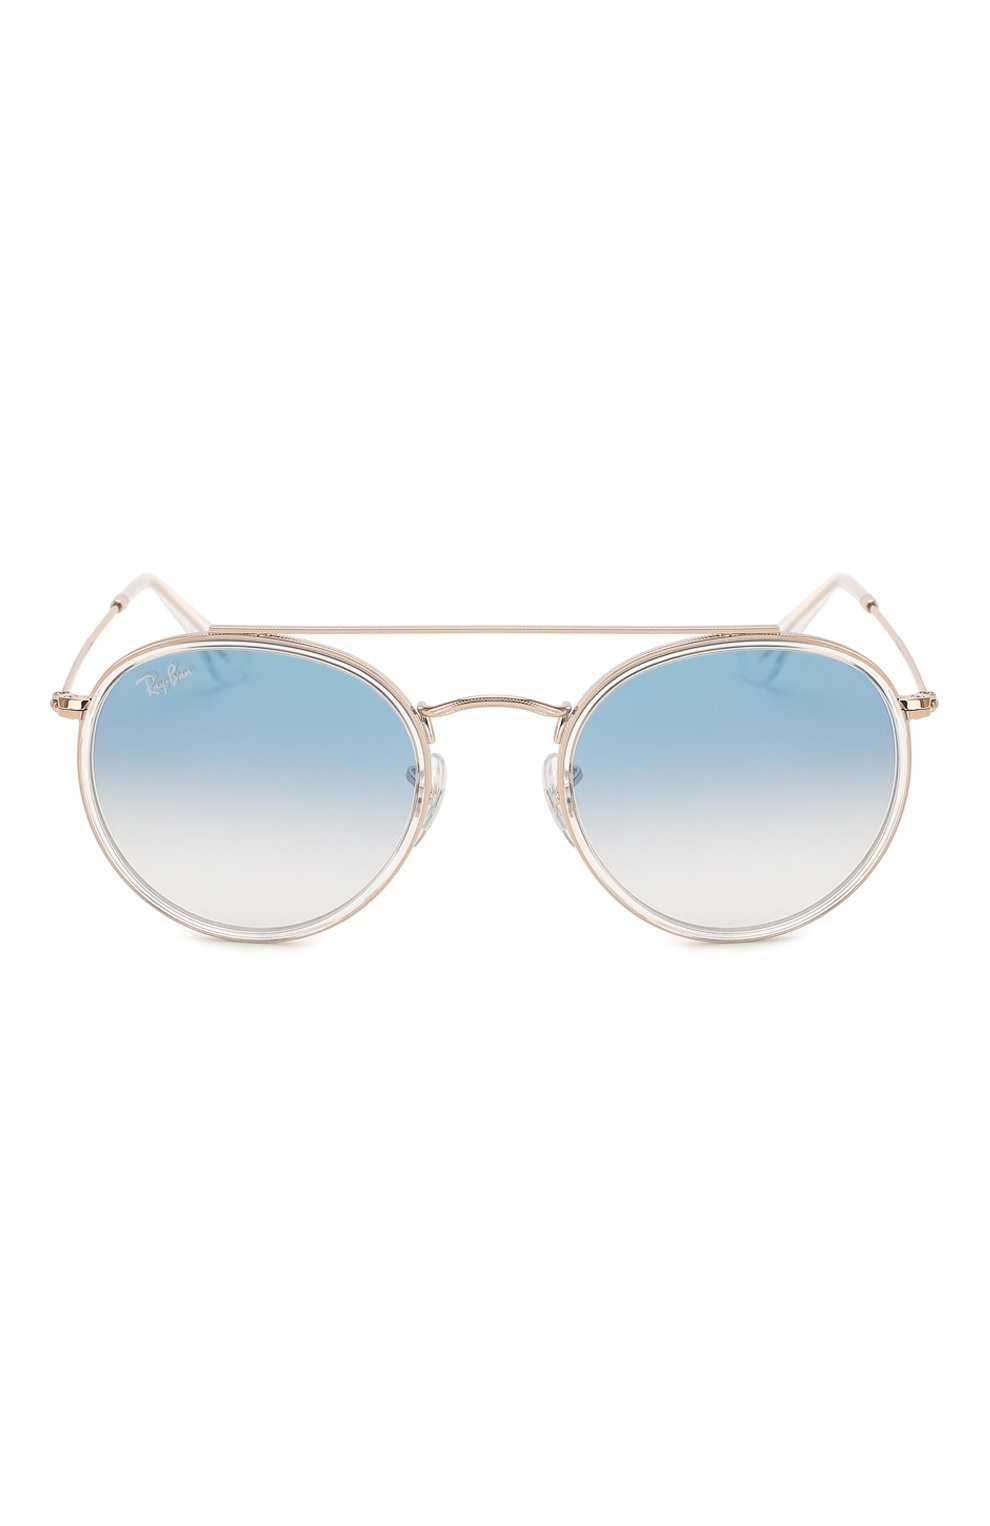 Женские солнцезащитные очки RAY-BAN голубого цвета, арт. 3647N-90683F | Фото 4